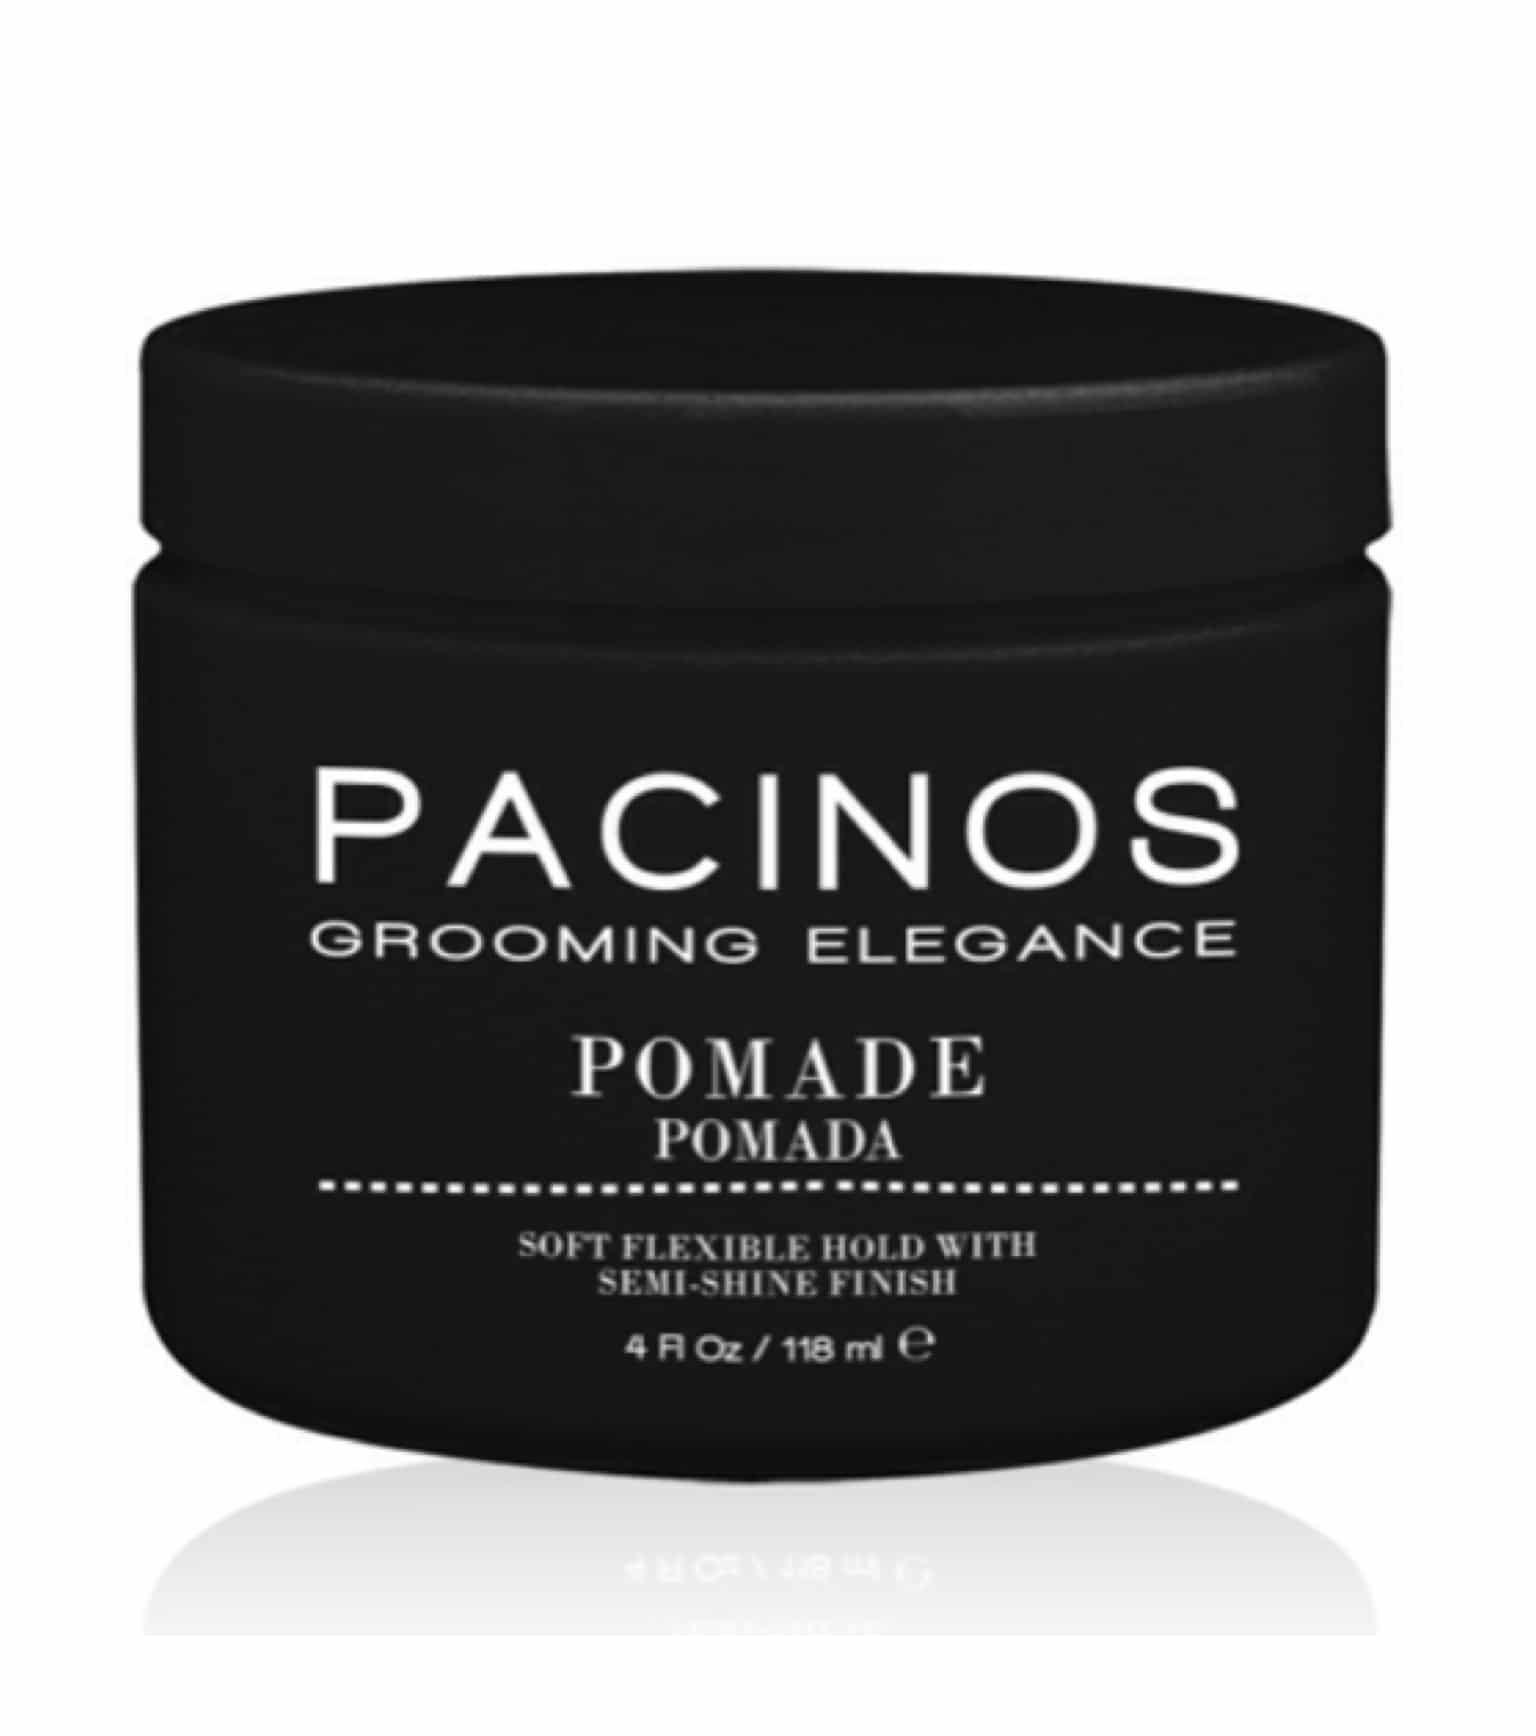 Pacinos Grooming Elegance Pomade 4oz Barber Depot